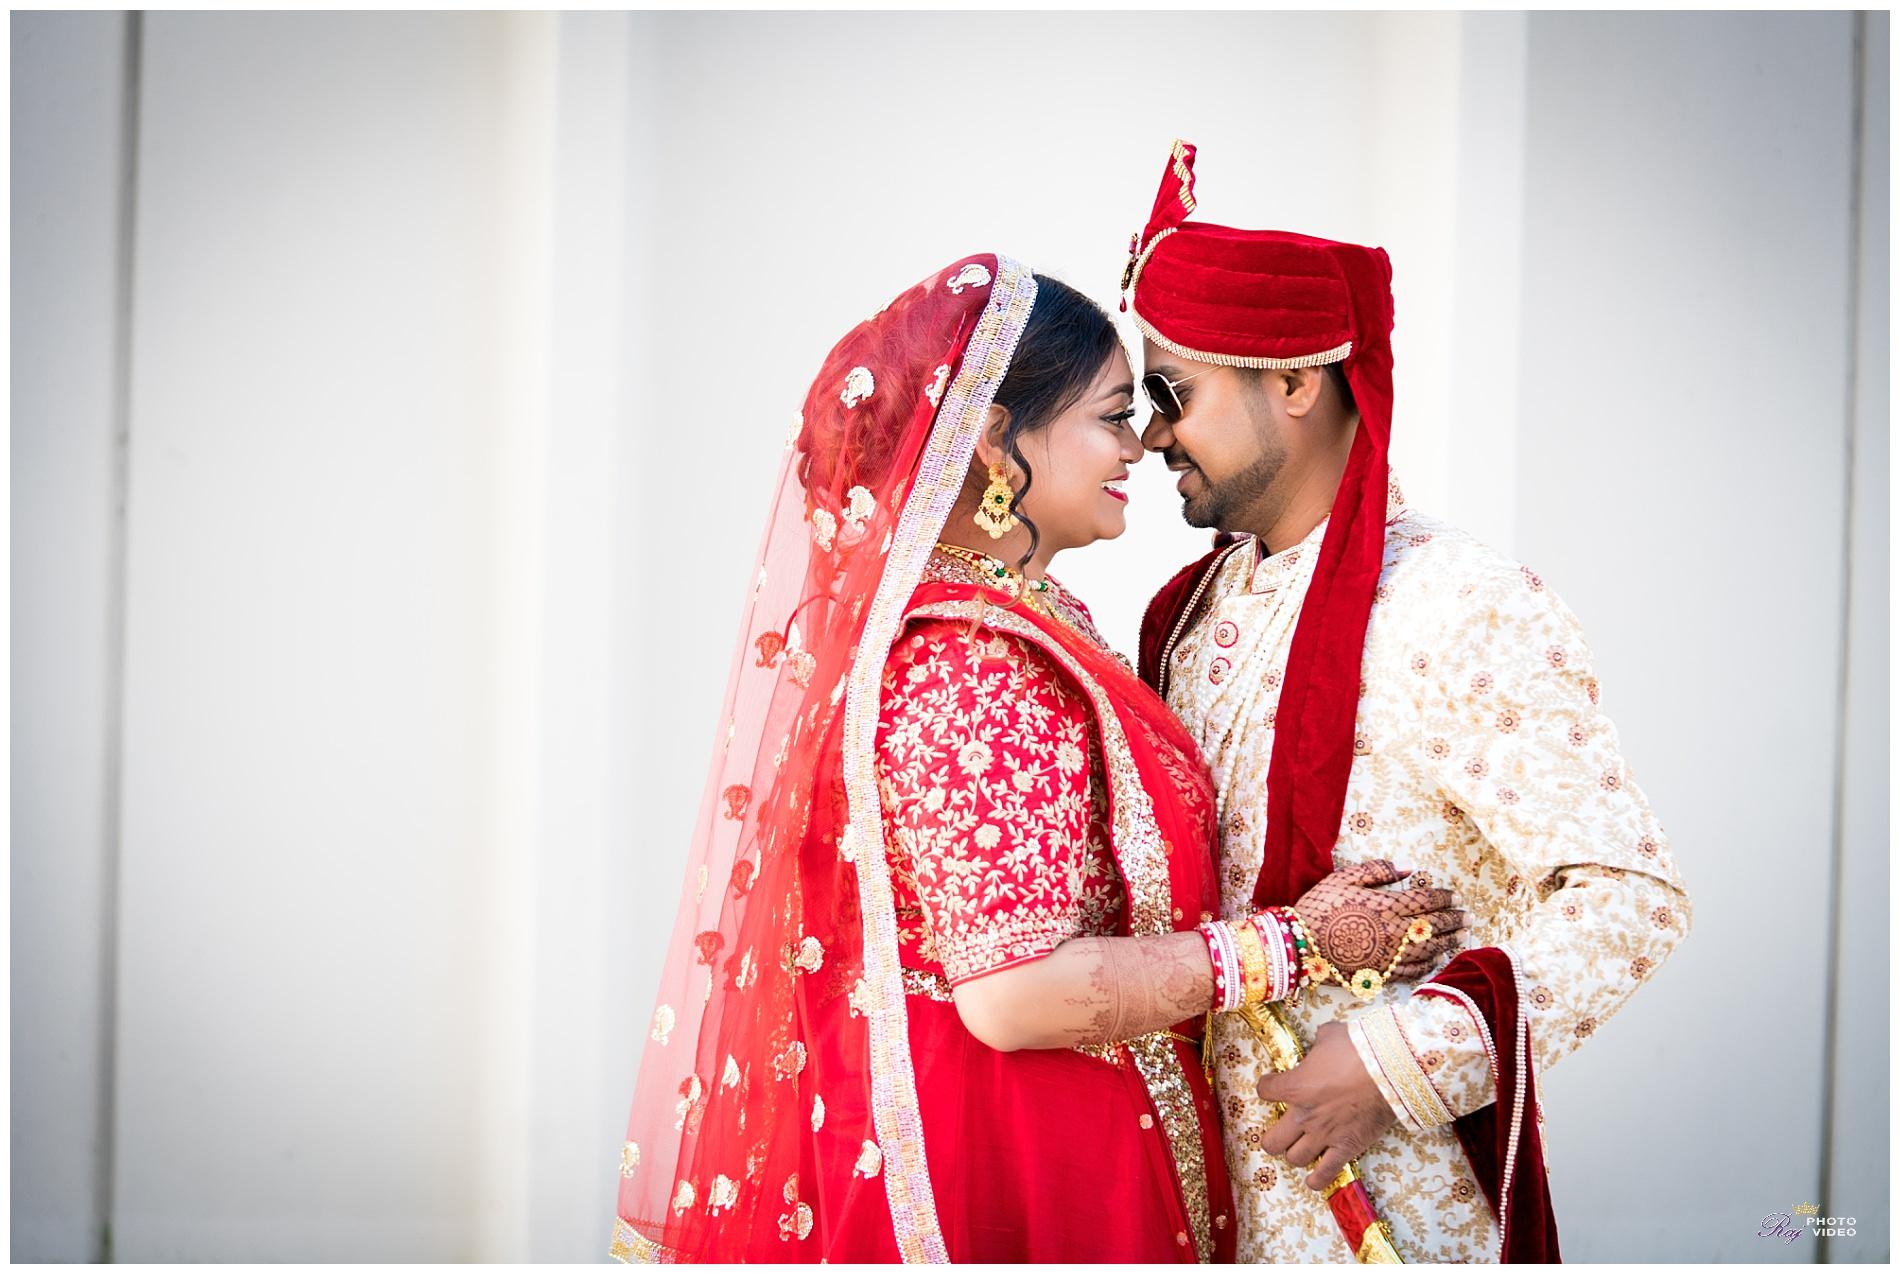 doubletree-by-hilton-hotel-wilmington-de-wedding-krishna-ritesh-28.jpg